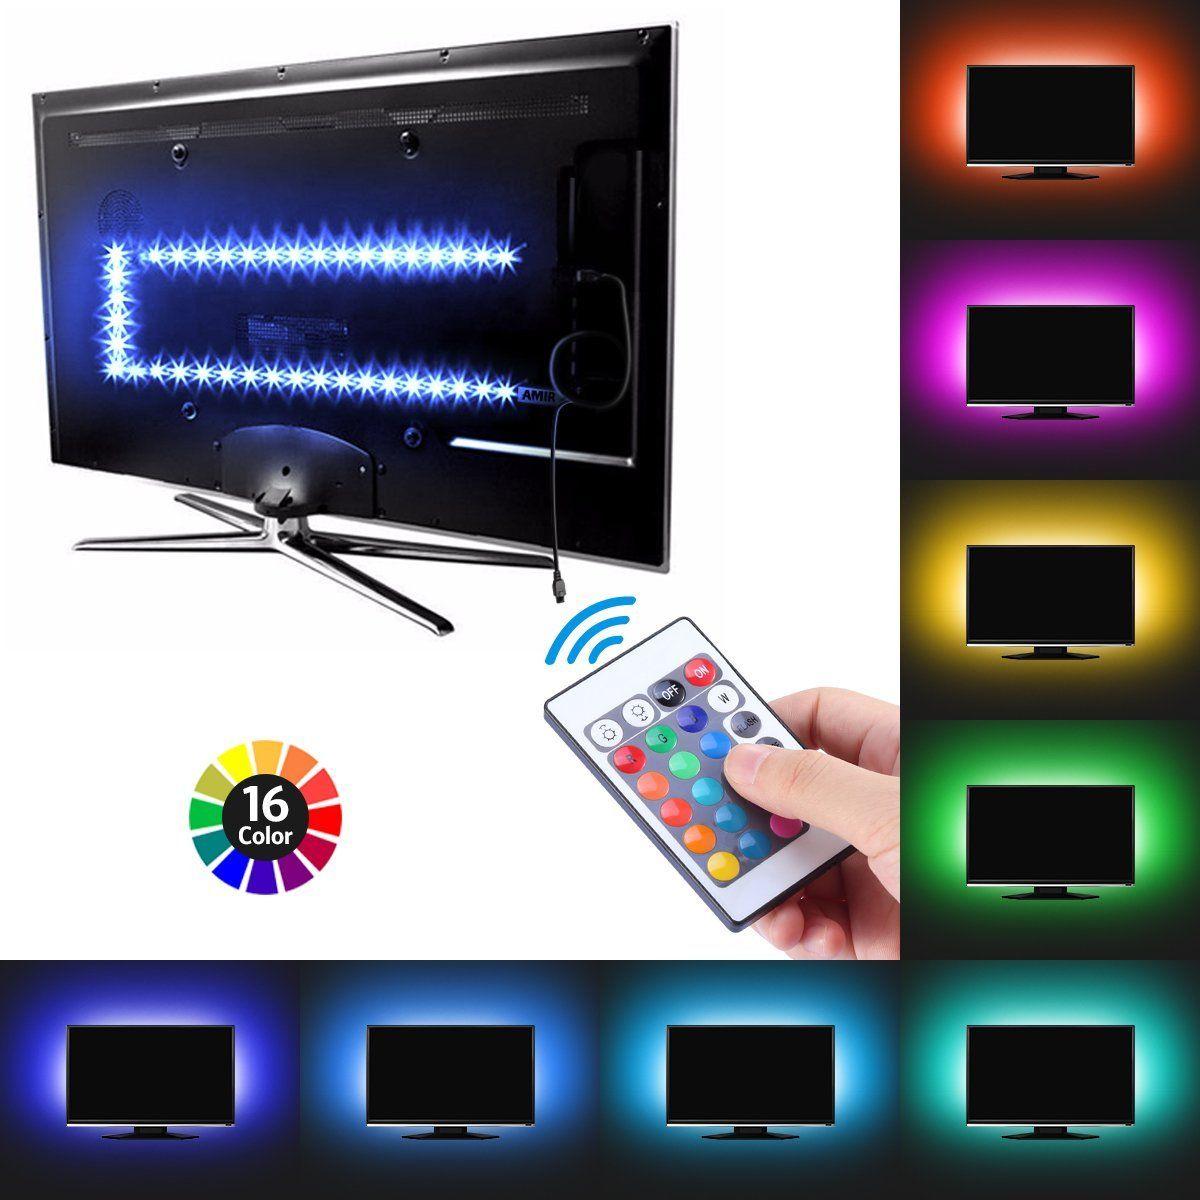 USB Powered RGB 5050 LED Strip Lighting for TV Computer Game Night Light VLOG